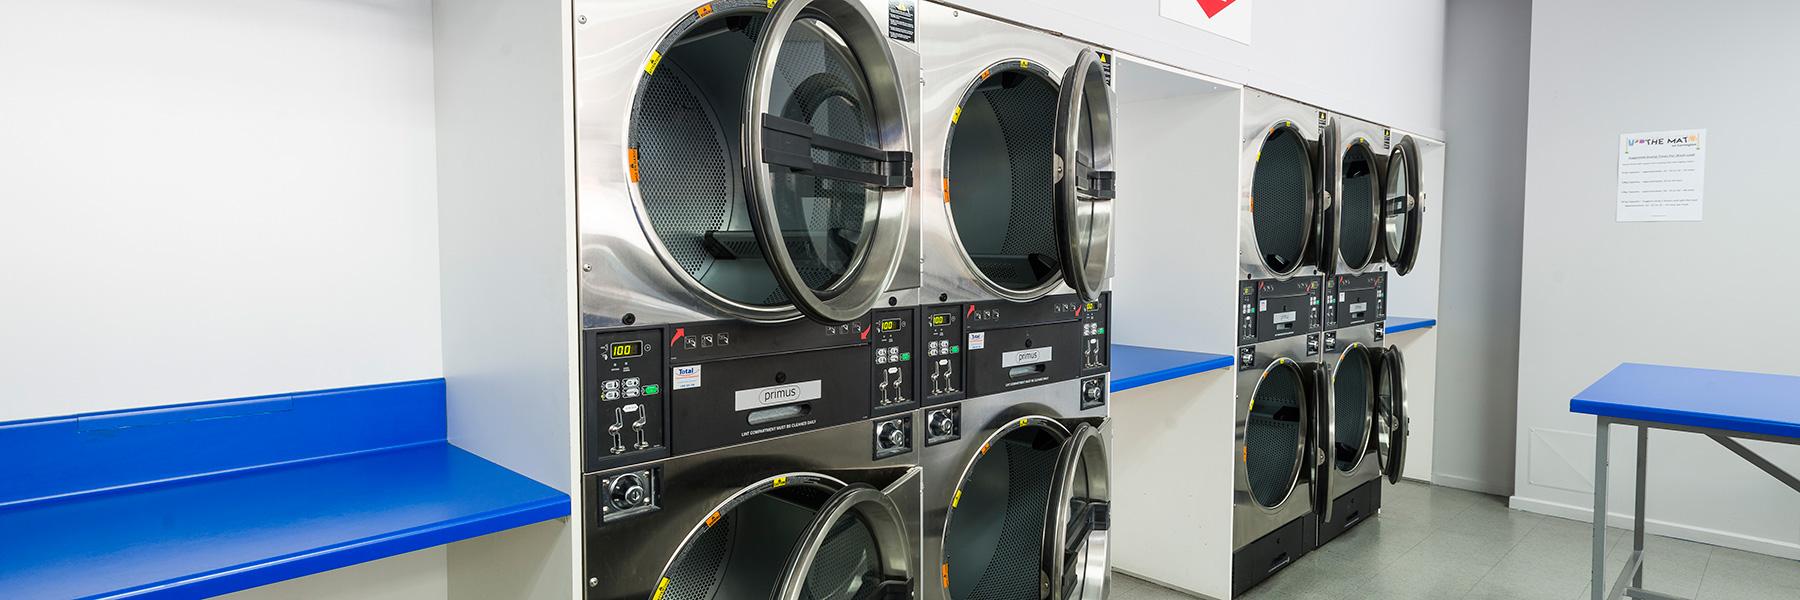 laundry-2